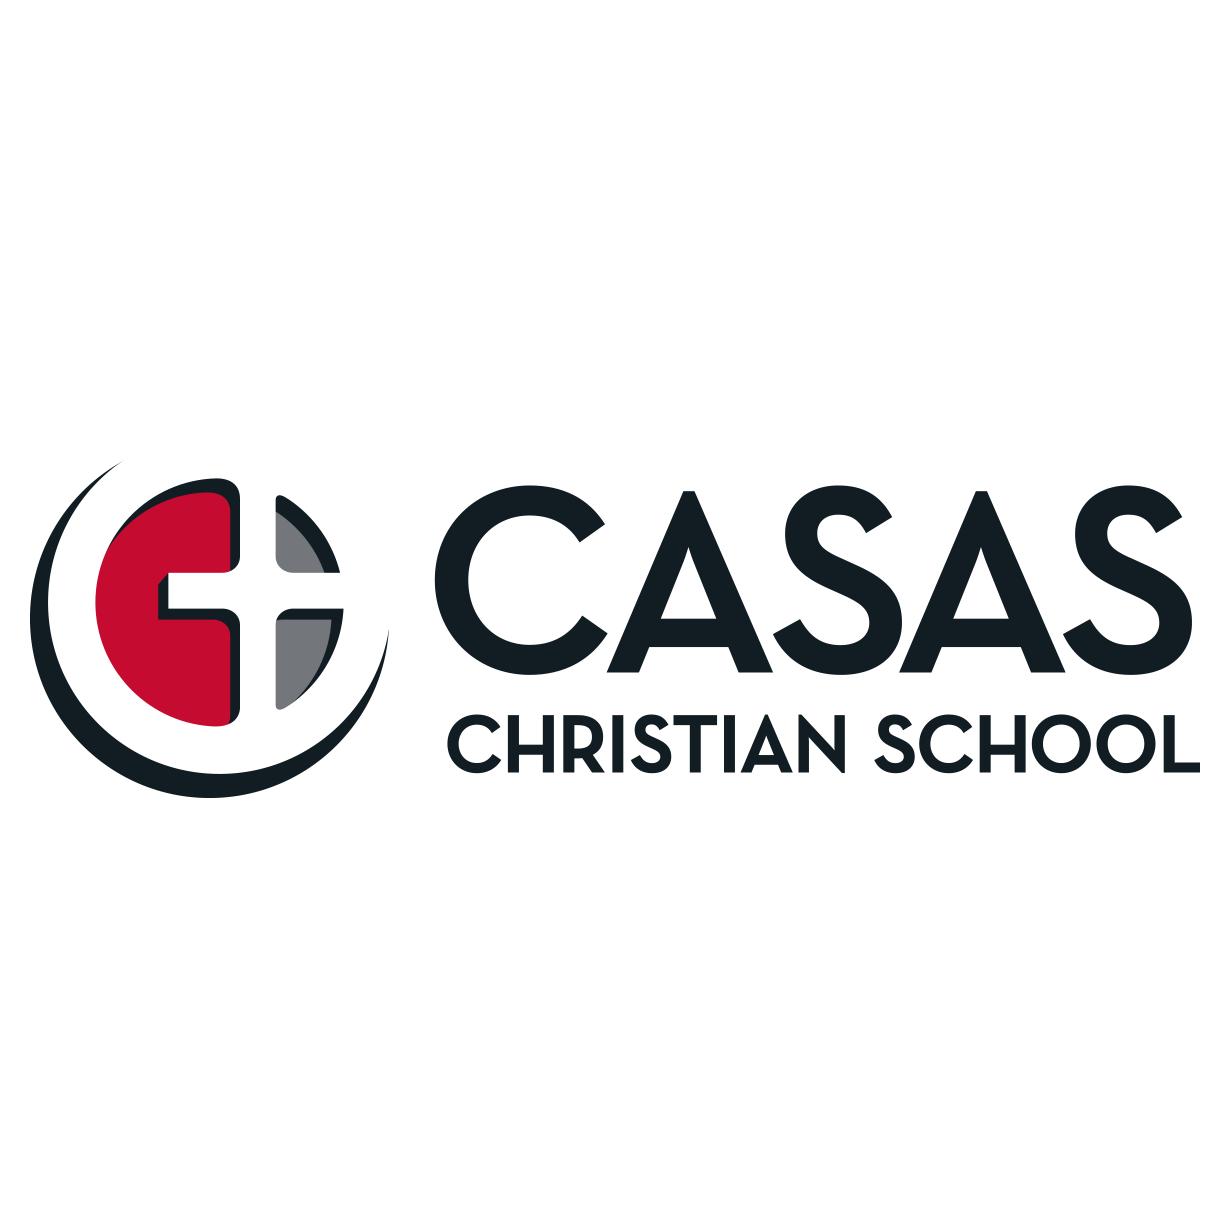 casas christian preschool casas christian school in oro valley az whitepages 987